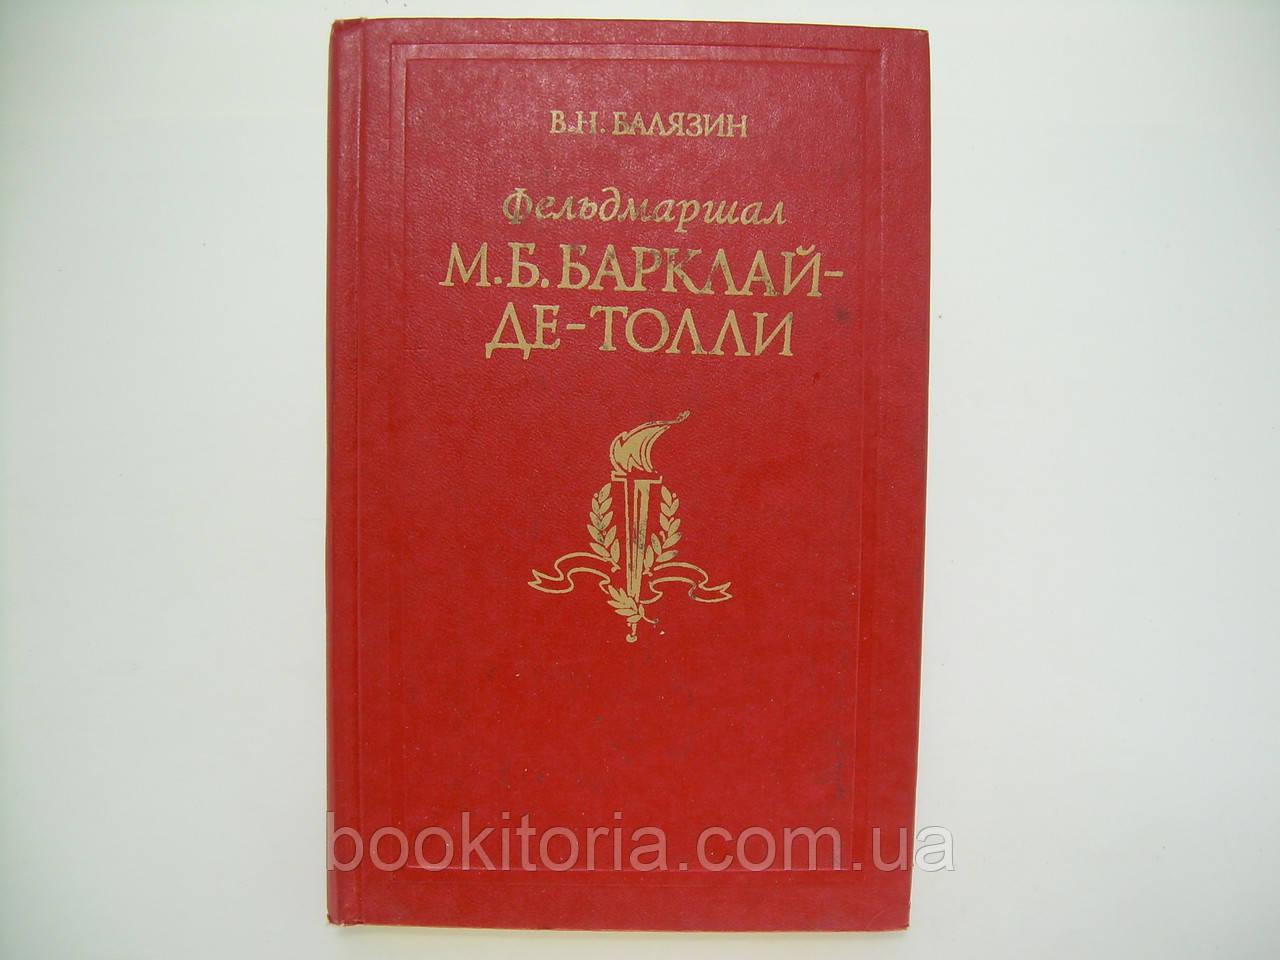 Балязин В.Н. Фельдмаршал М.Б. Барклай-де-Толли (б/у).